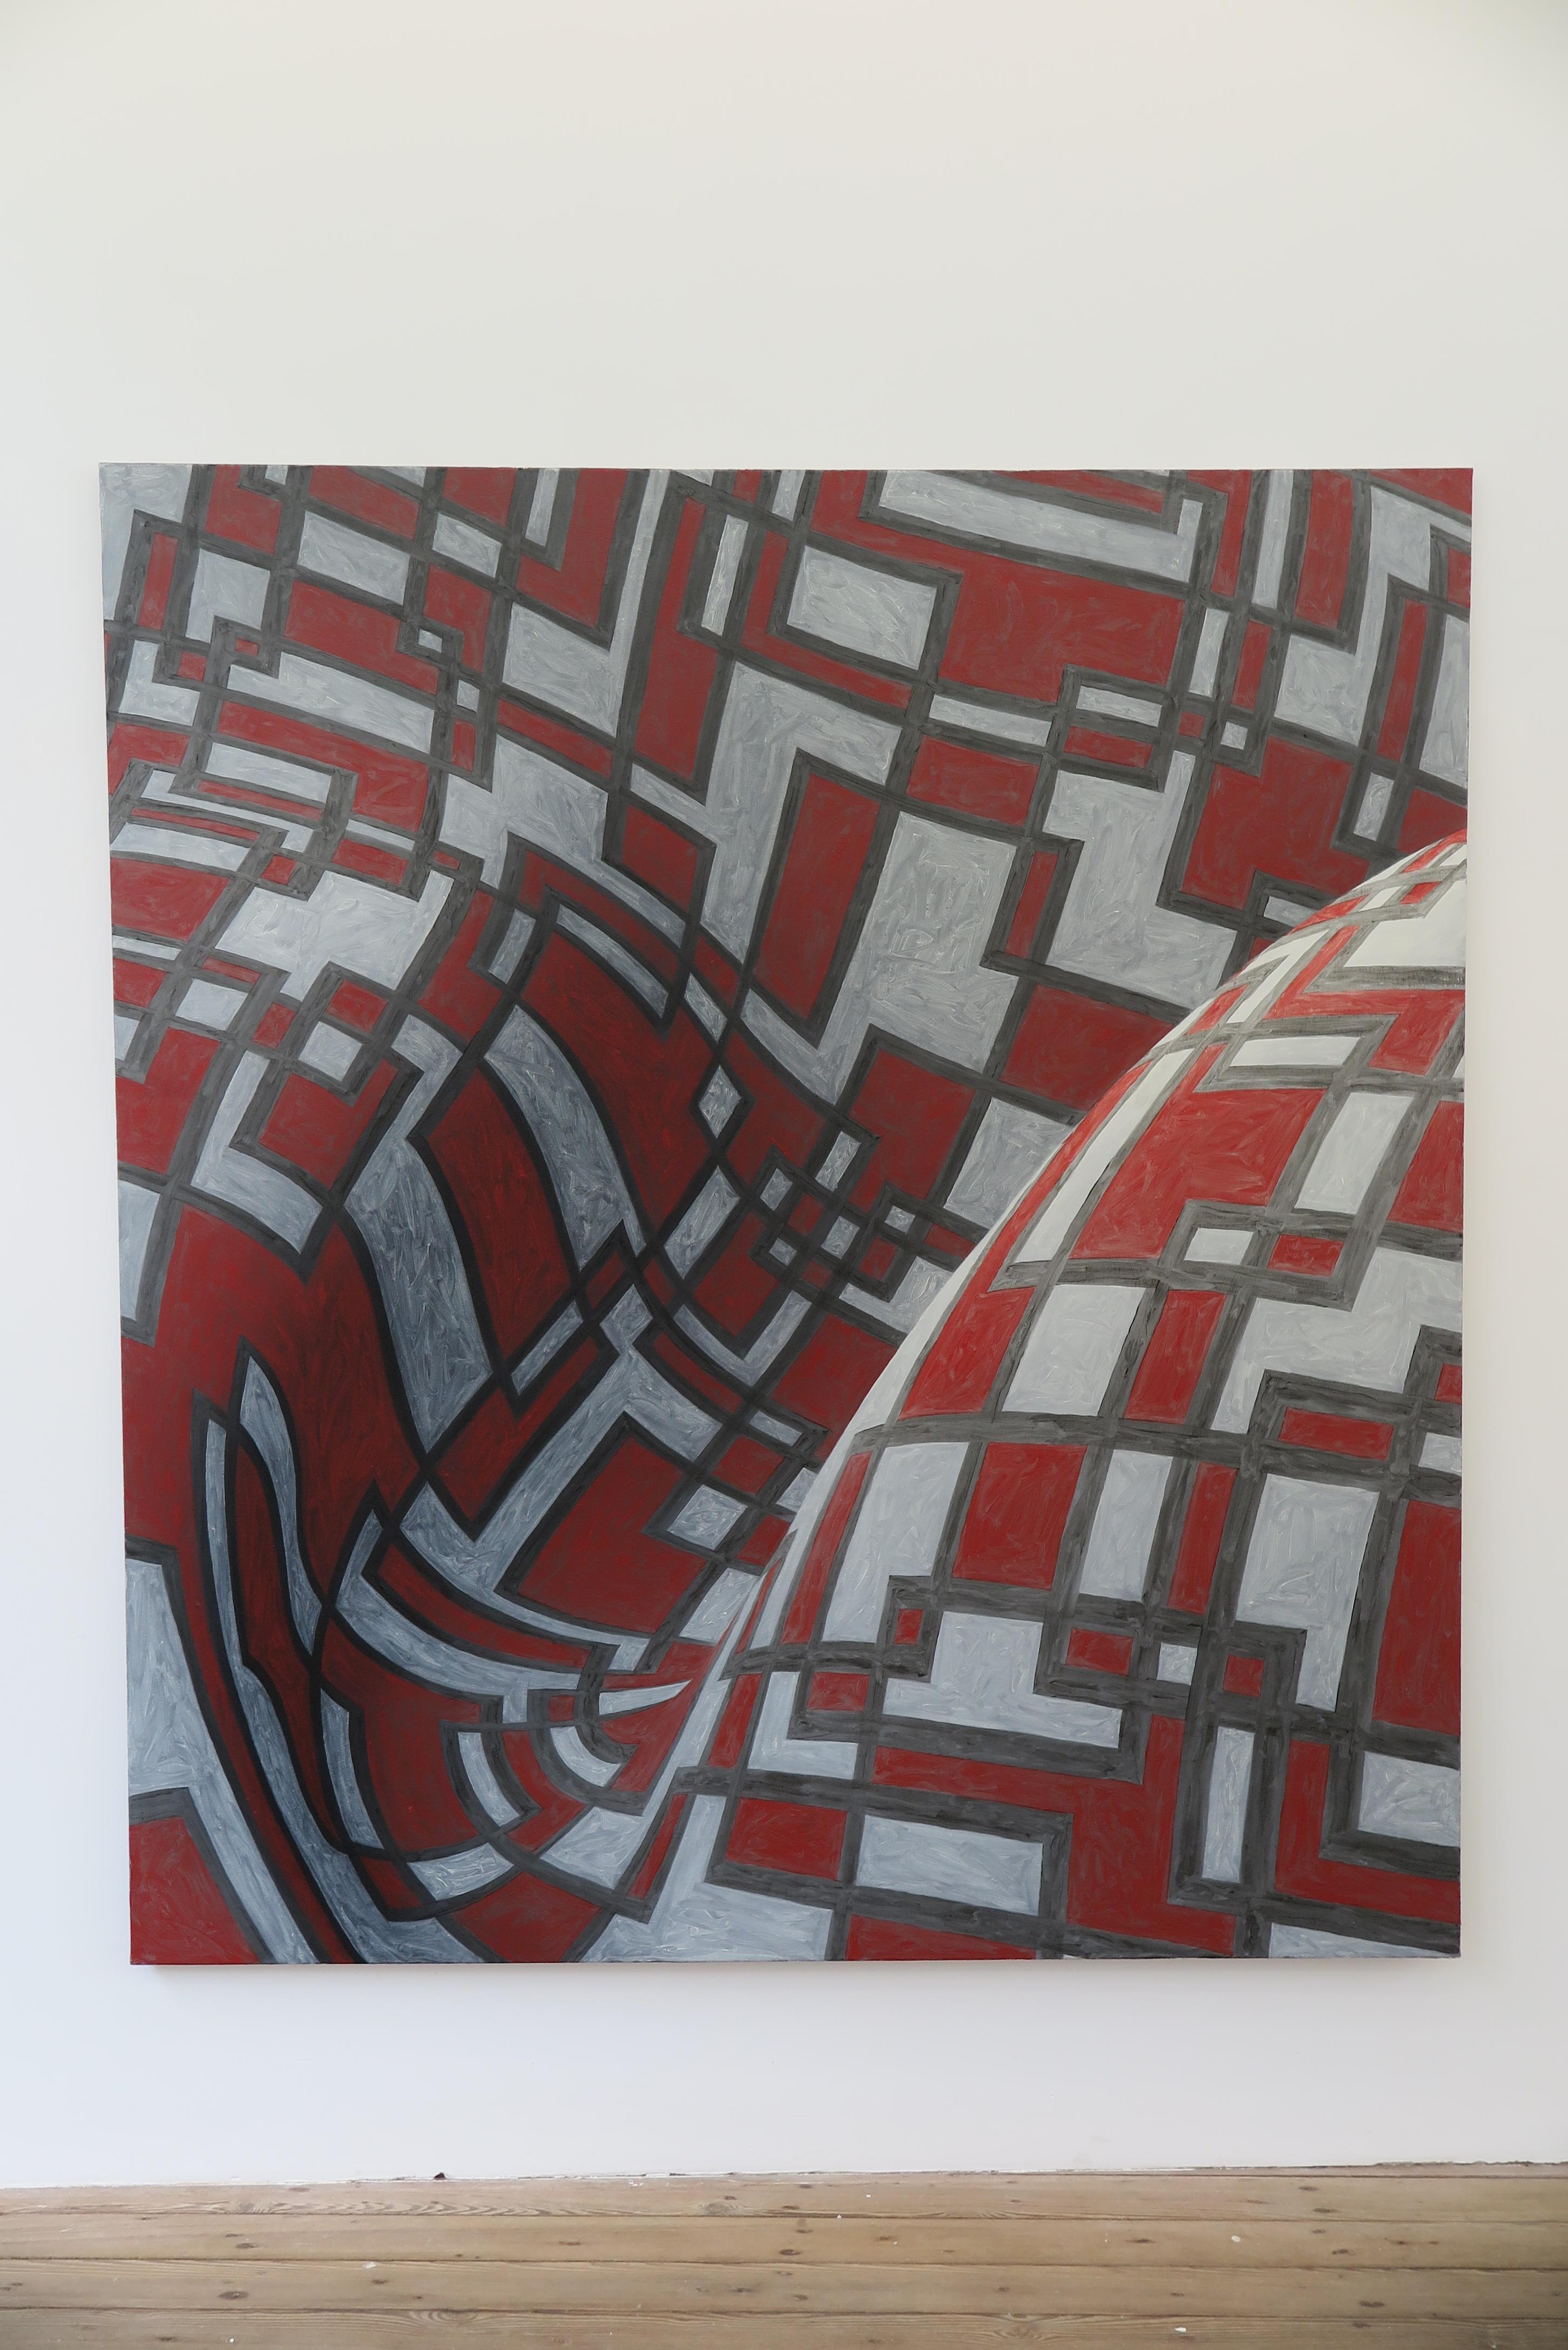 Peter Schuyff - Galerie Gabriel Rolt